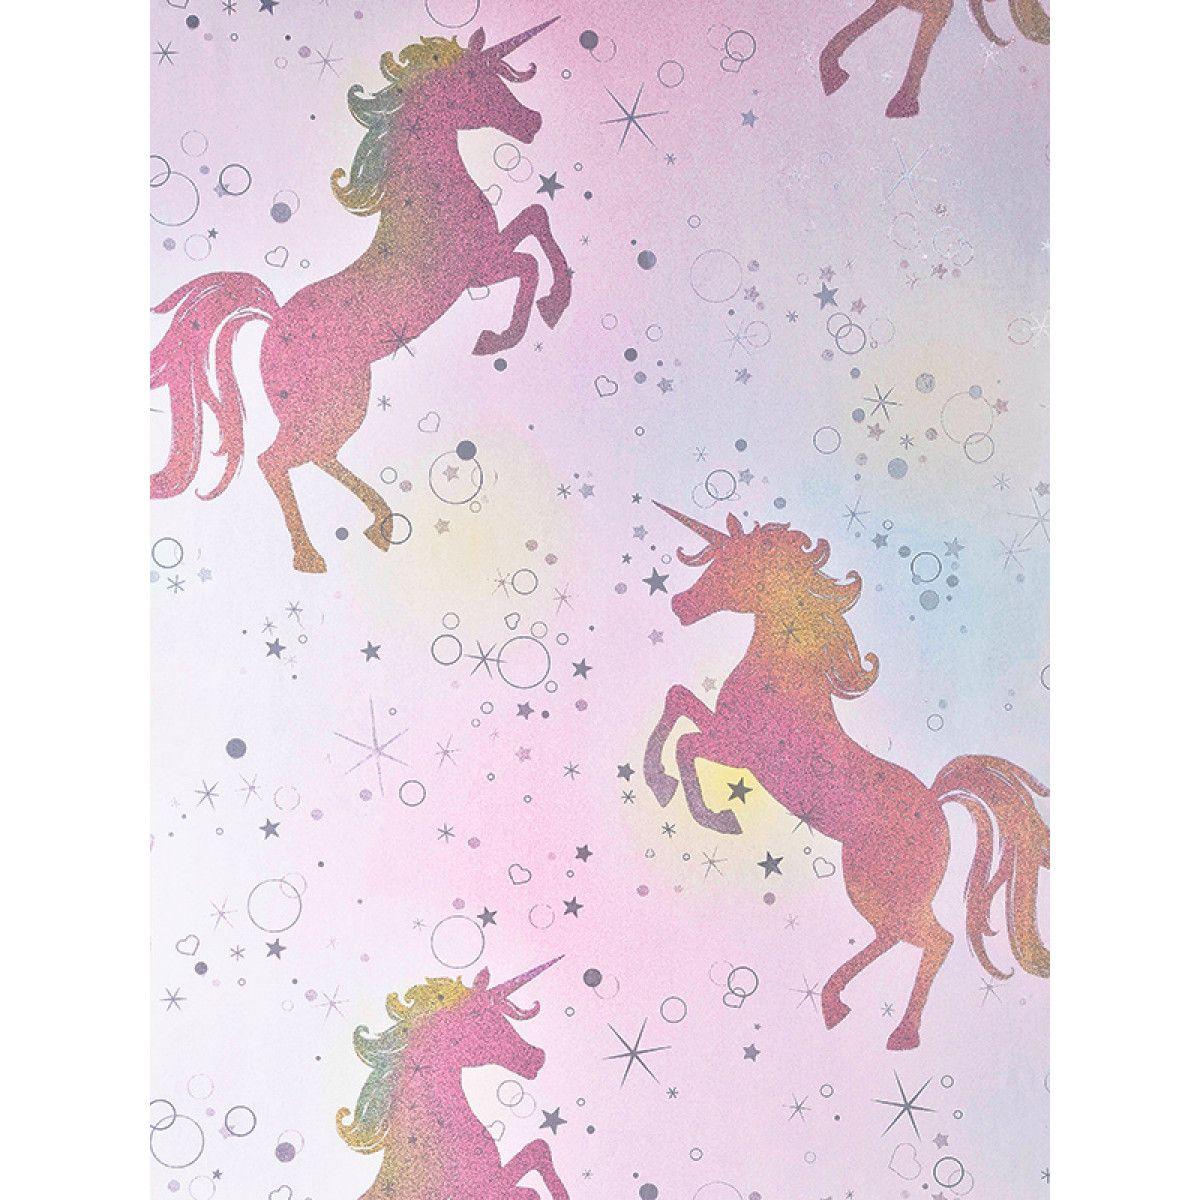 Be Dazzled Dancing Unicorn Wallpaper Rainbow Coloroll M1423 Unicorn Wallpaper Glitter Wallpaper Rainbow Wallpaper